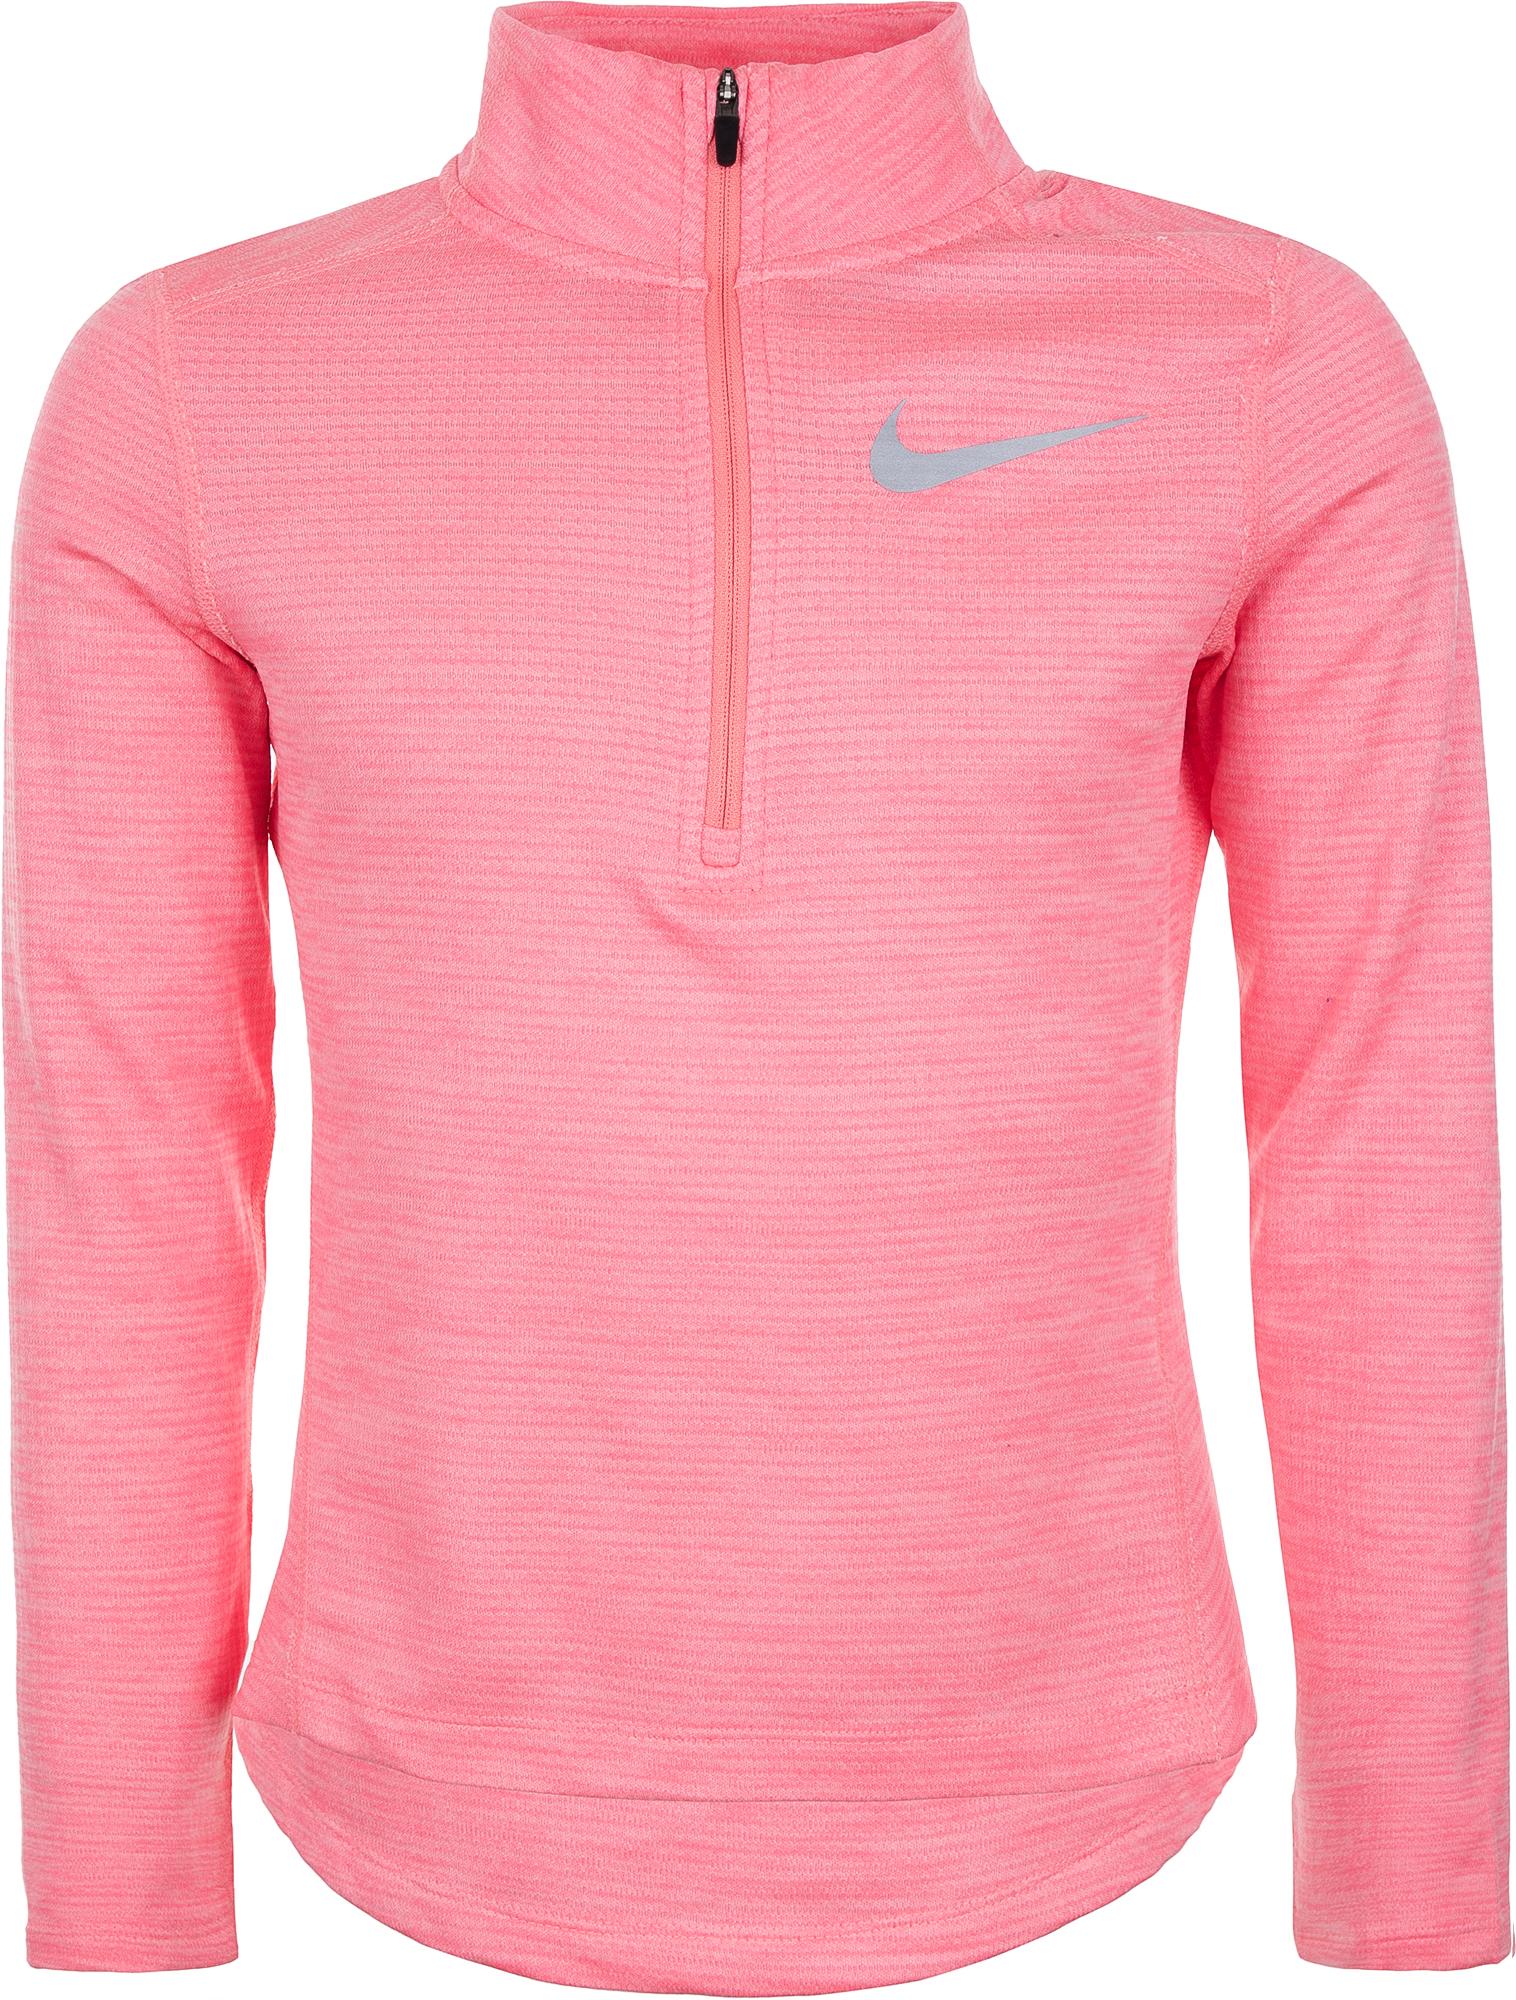 Nike Олимпийка для девочек Nike, размер 156-164 одежда для занятий баскетболом nike 005027 11 diy